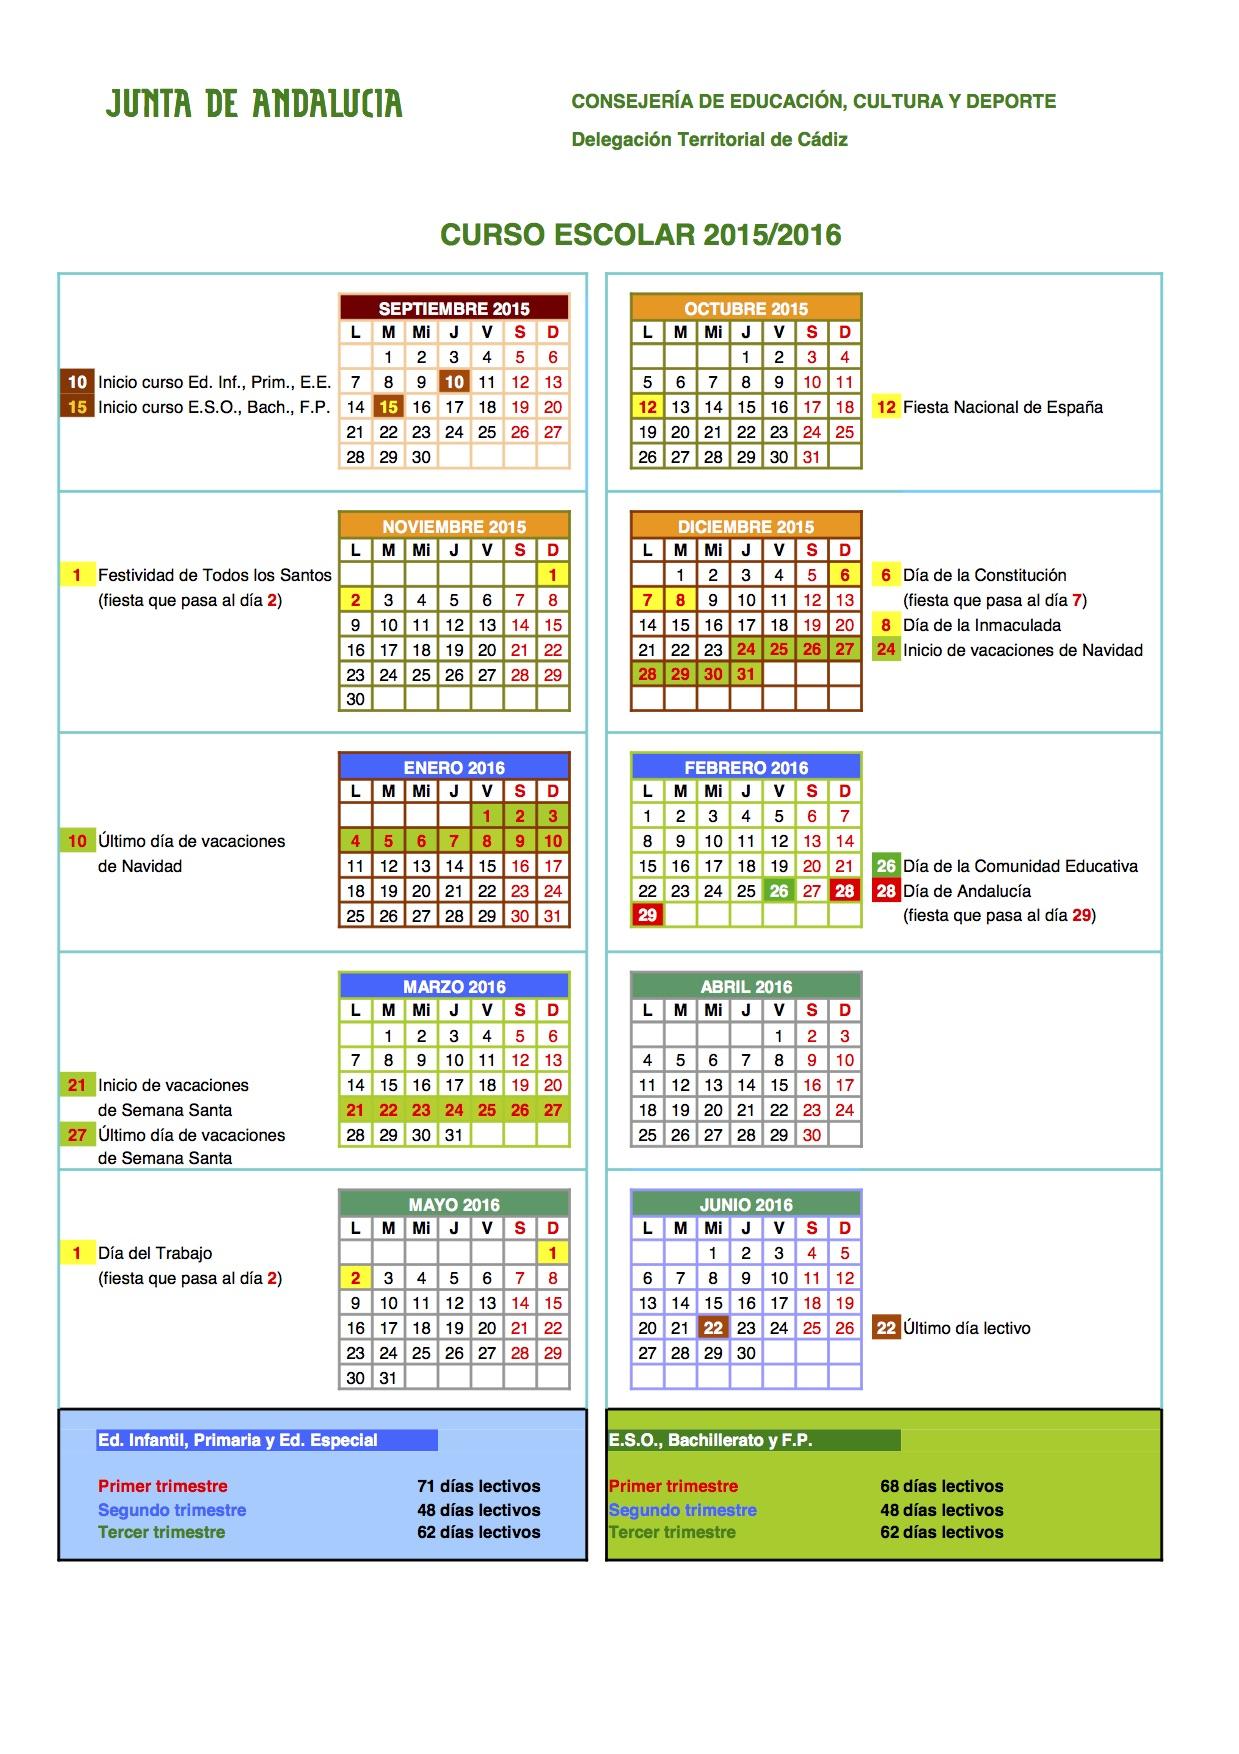 La clase de manolo calendario escolar for Consejeria de educacion junta de andalucia